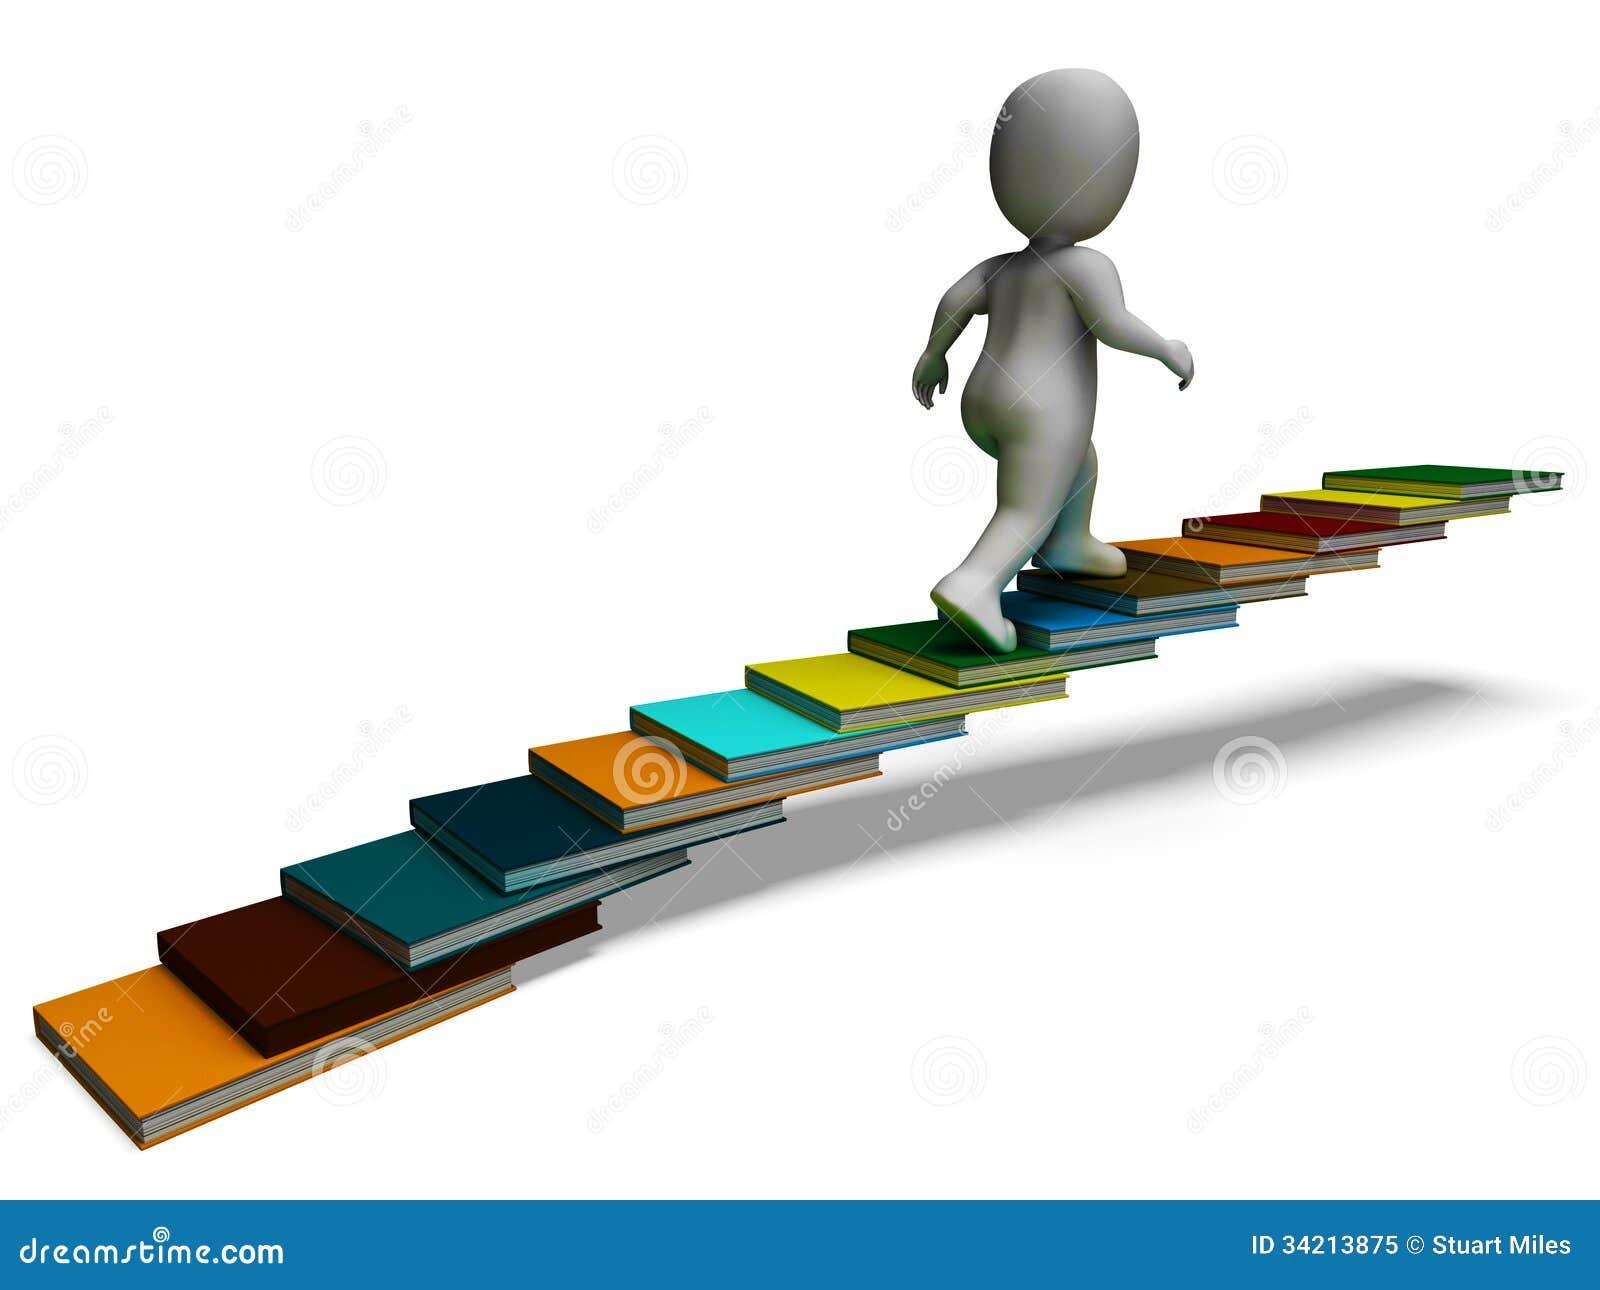 Student Climbing Books Showing Education Stock Illustration ... for Student Climbing Ladder  34eri